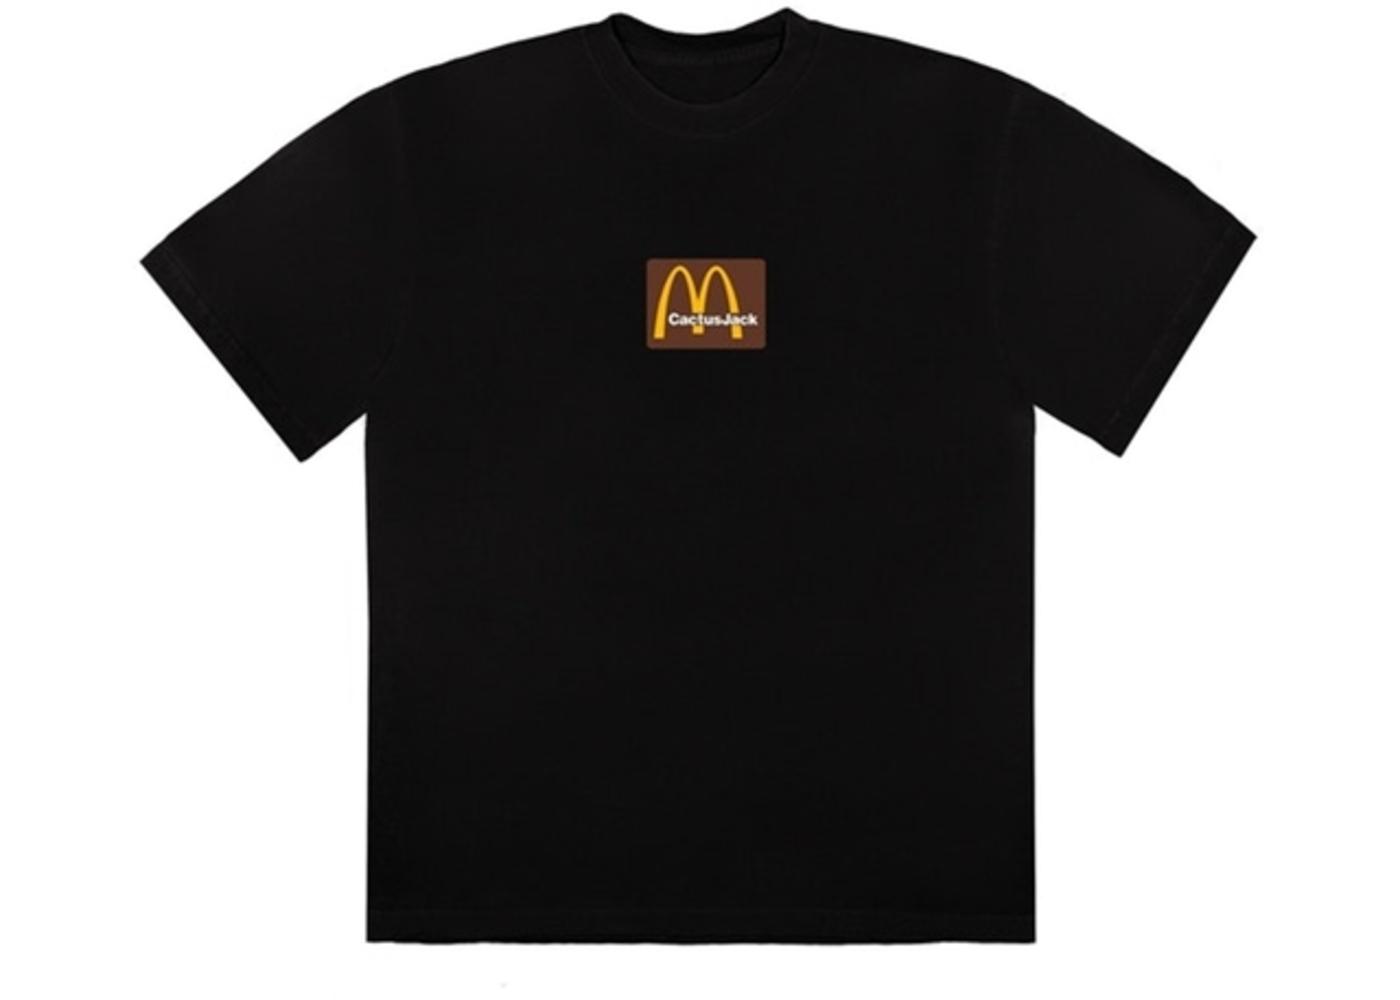 Travis Scott x McDonald's Sesame Inv T-Shirt Black/Brownの写真